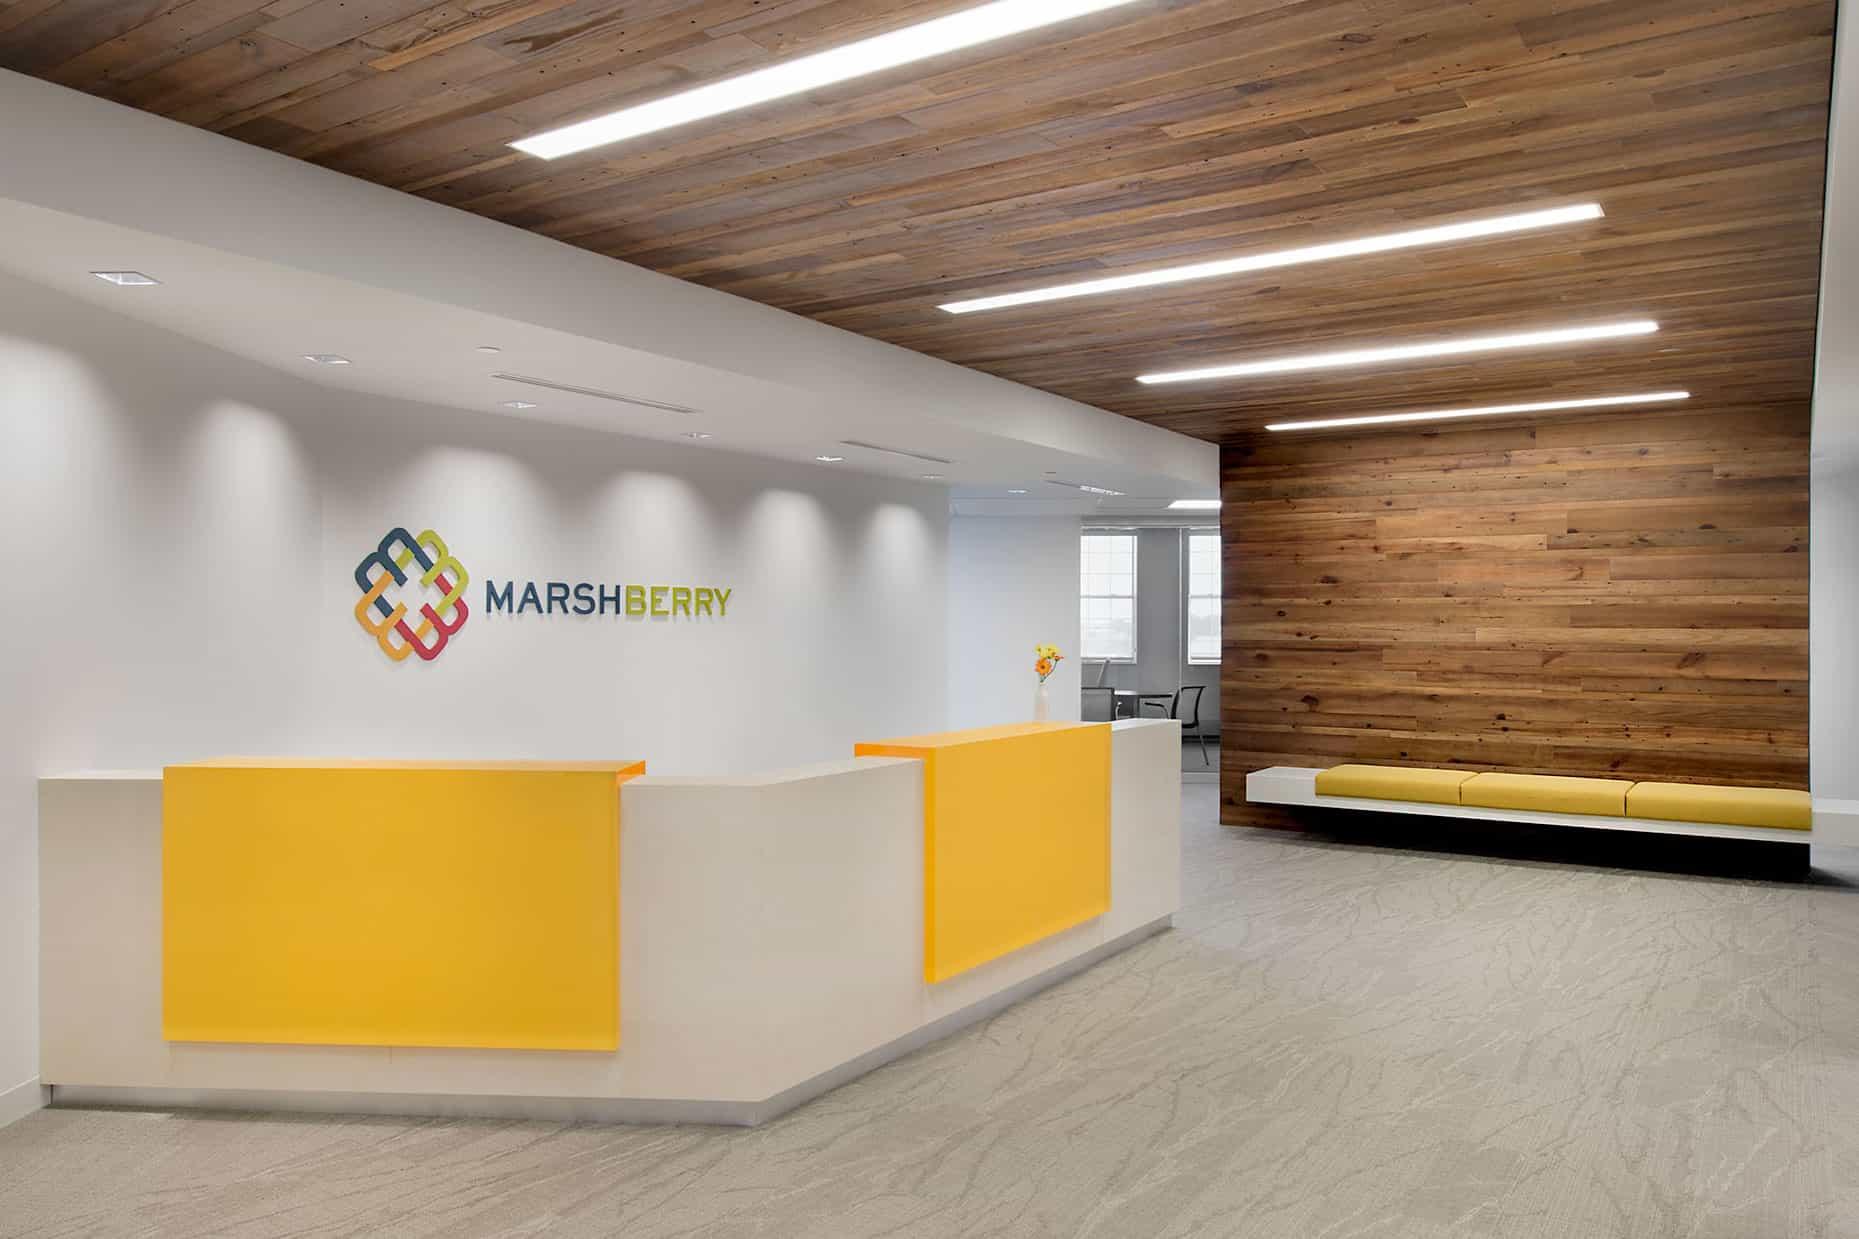 Marshberry Corporation